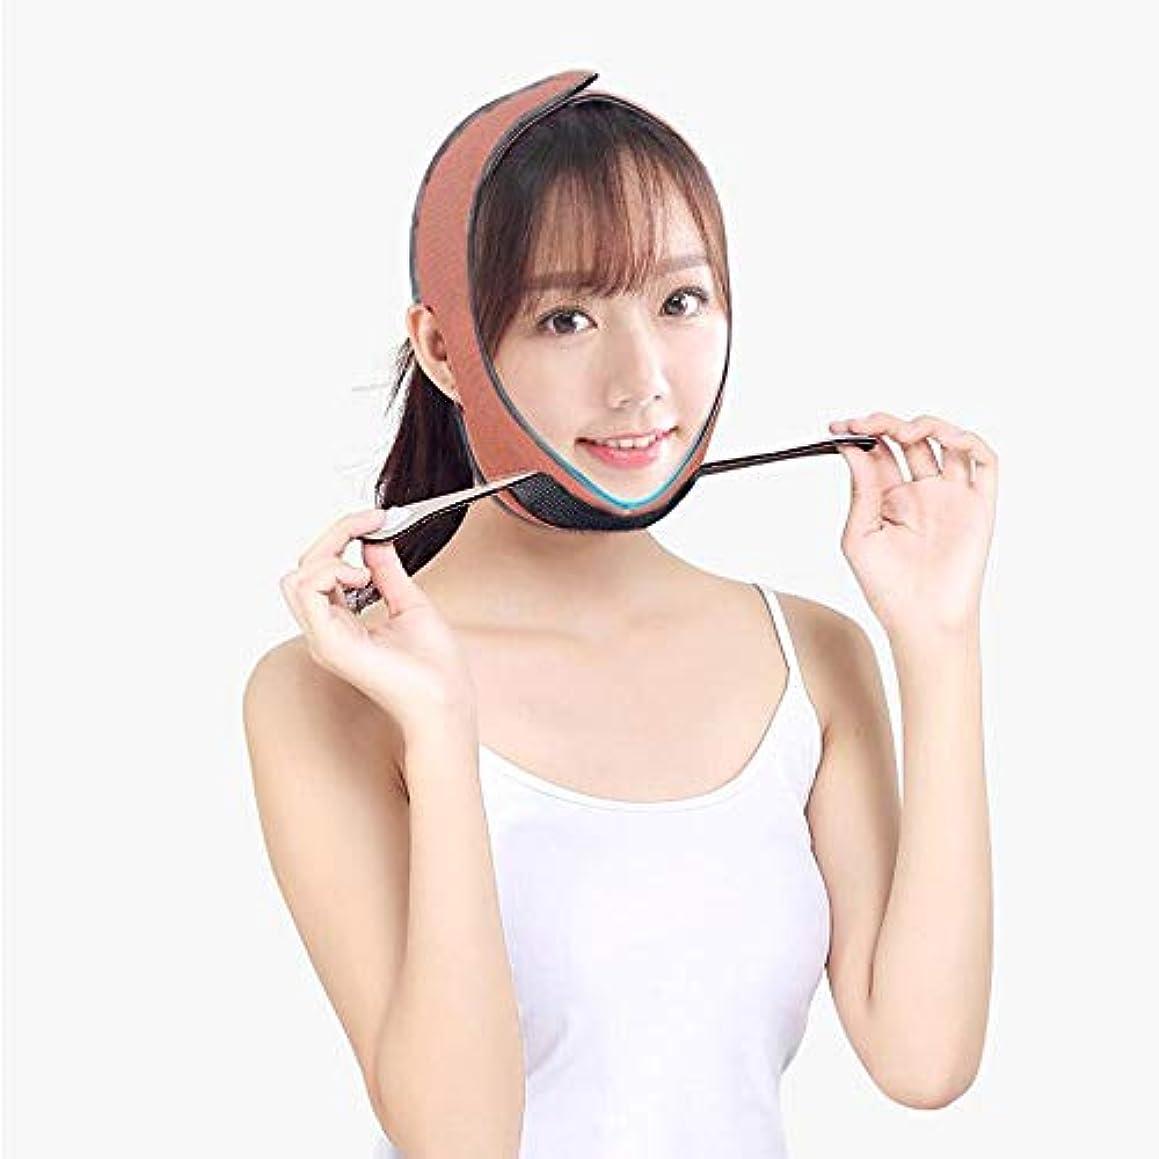 BS フェイシャルリフティングスリミングベルト - 薄いフェイス包帯Vフェイス包帯マスクフェイシャルマッサージャー無料整形マスク顔と首の顔を引き締めますスリム フェイスリフティングアーティファクト